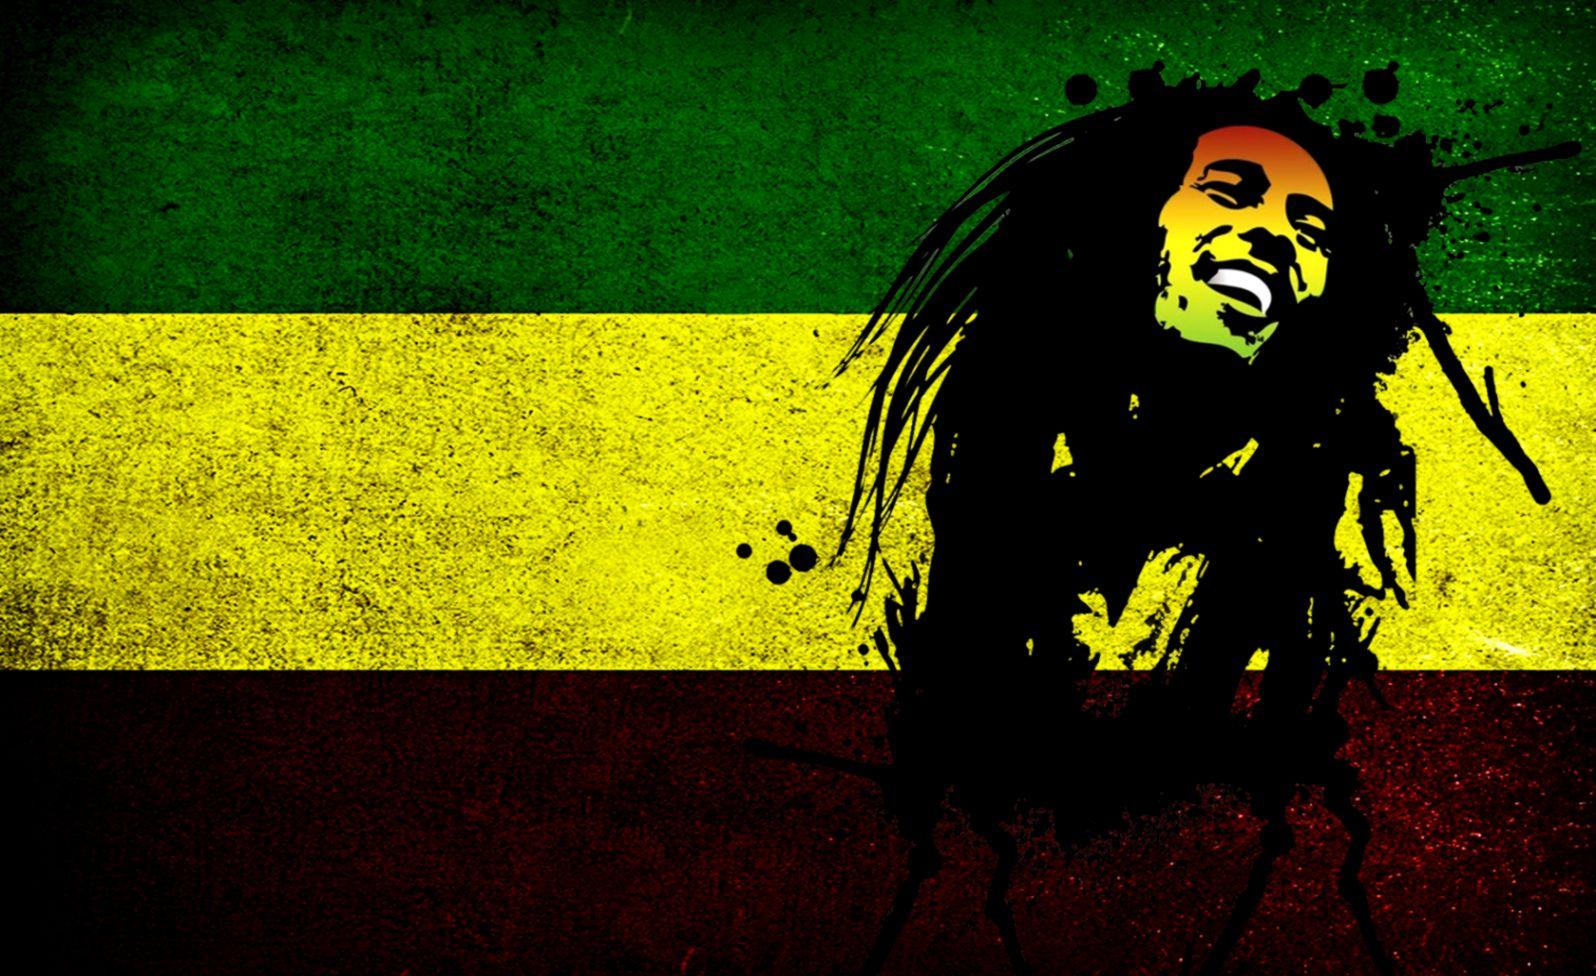 Bob Marley Reggae Music Hd Wallpaper Mega Wallpapers